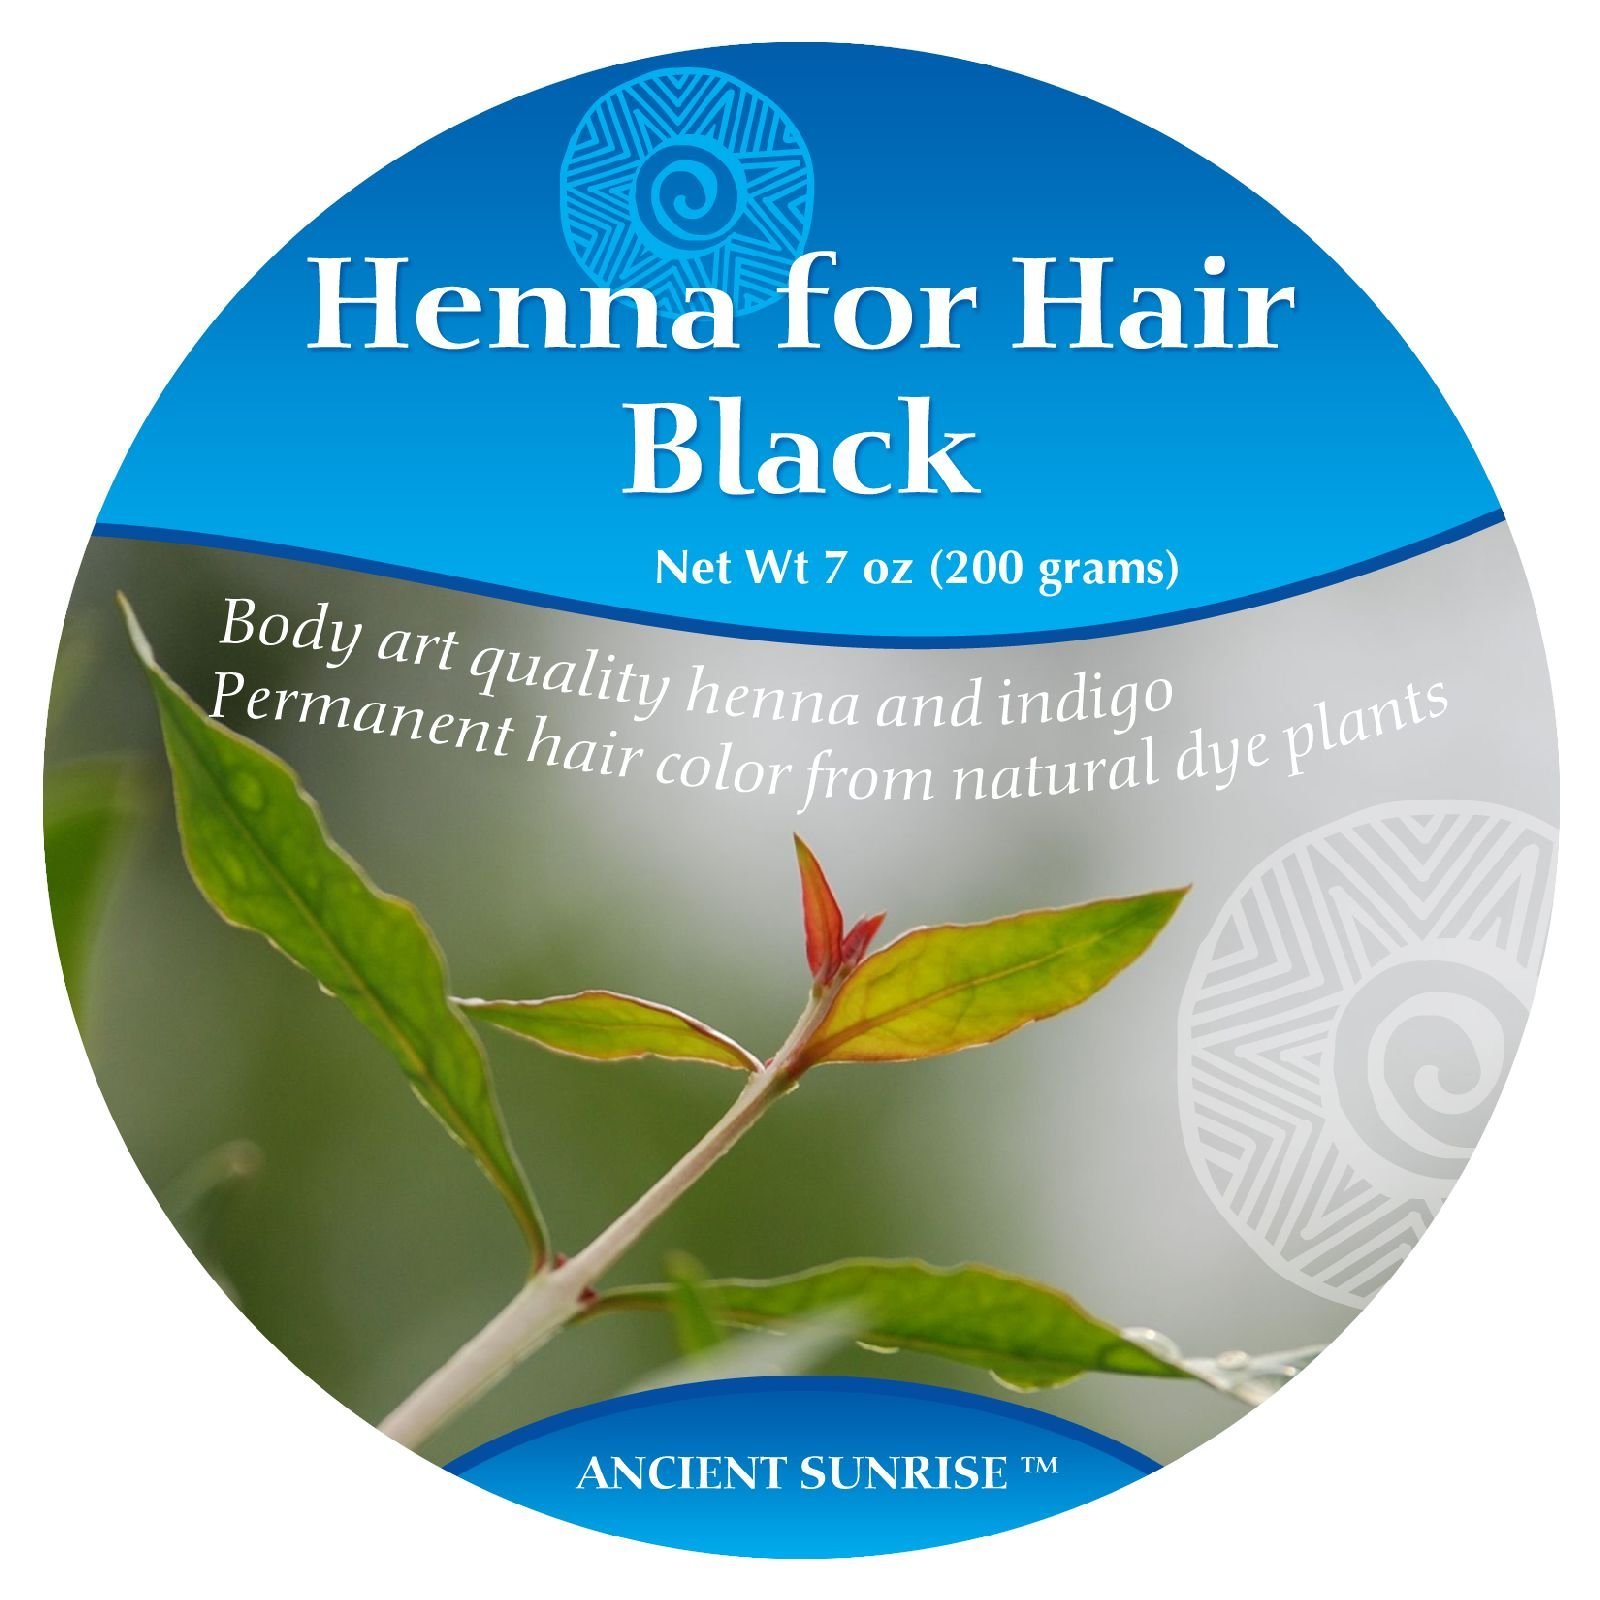 Ancient Sunrise Henna For Hair Black Kit by Ancient Sunrise